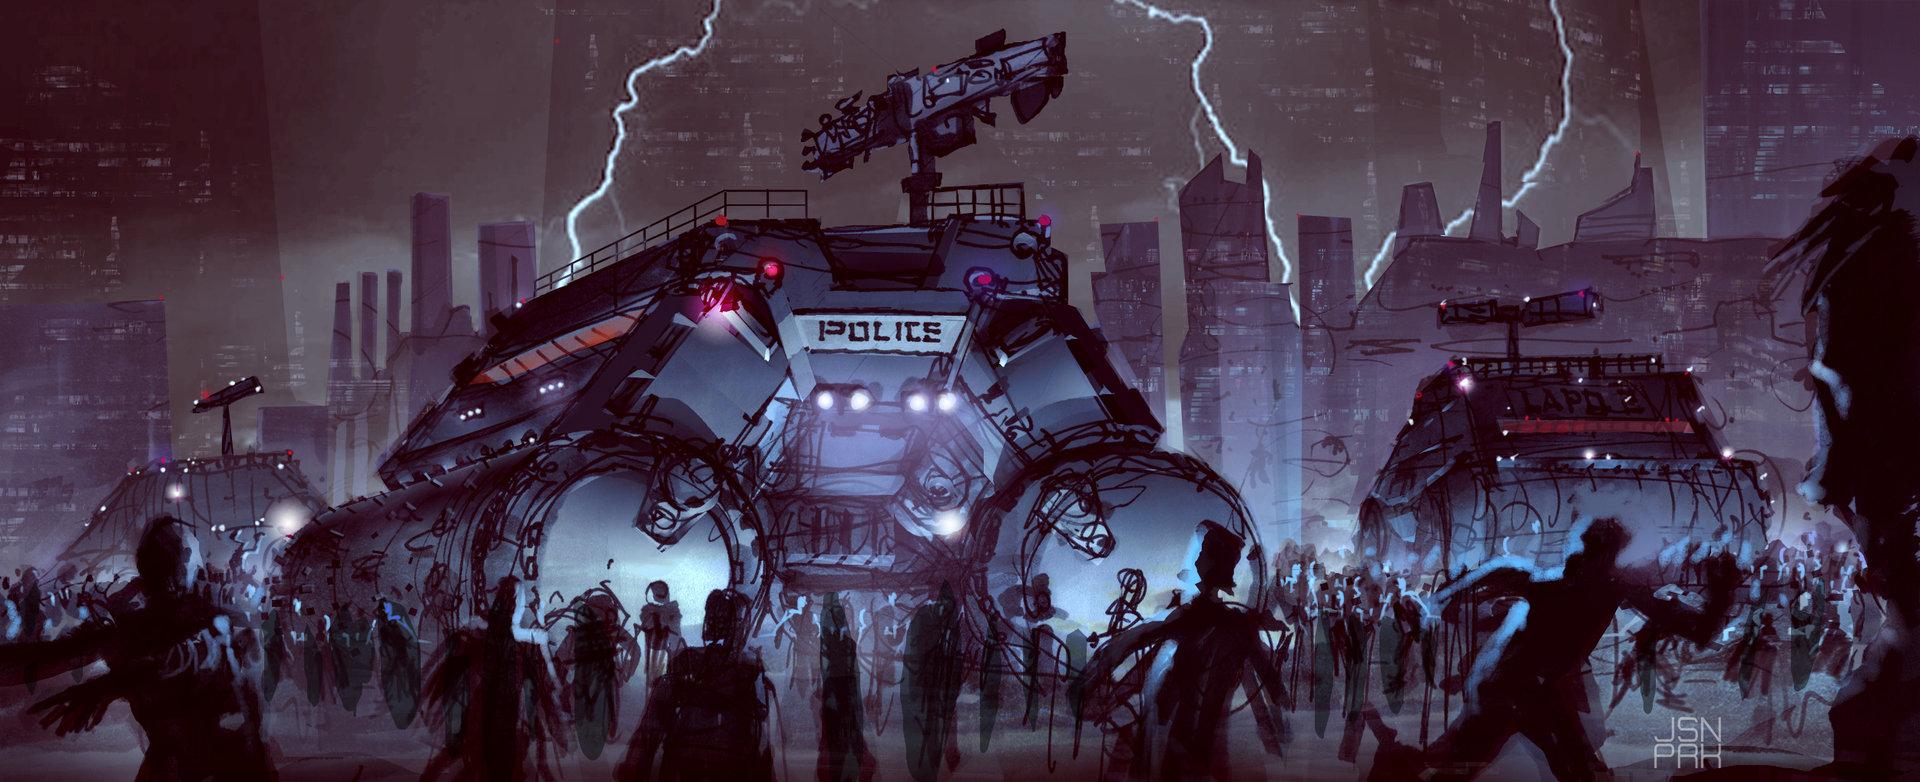 ArtStation - LAPD police state 2078, jason park